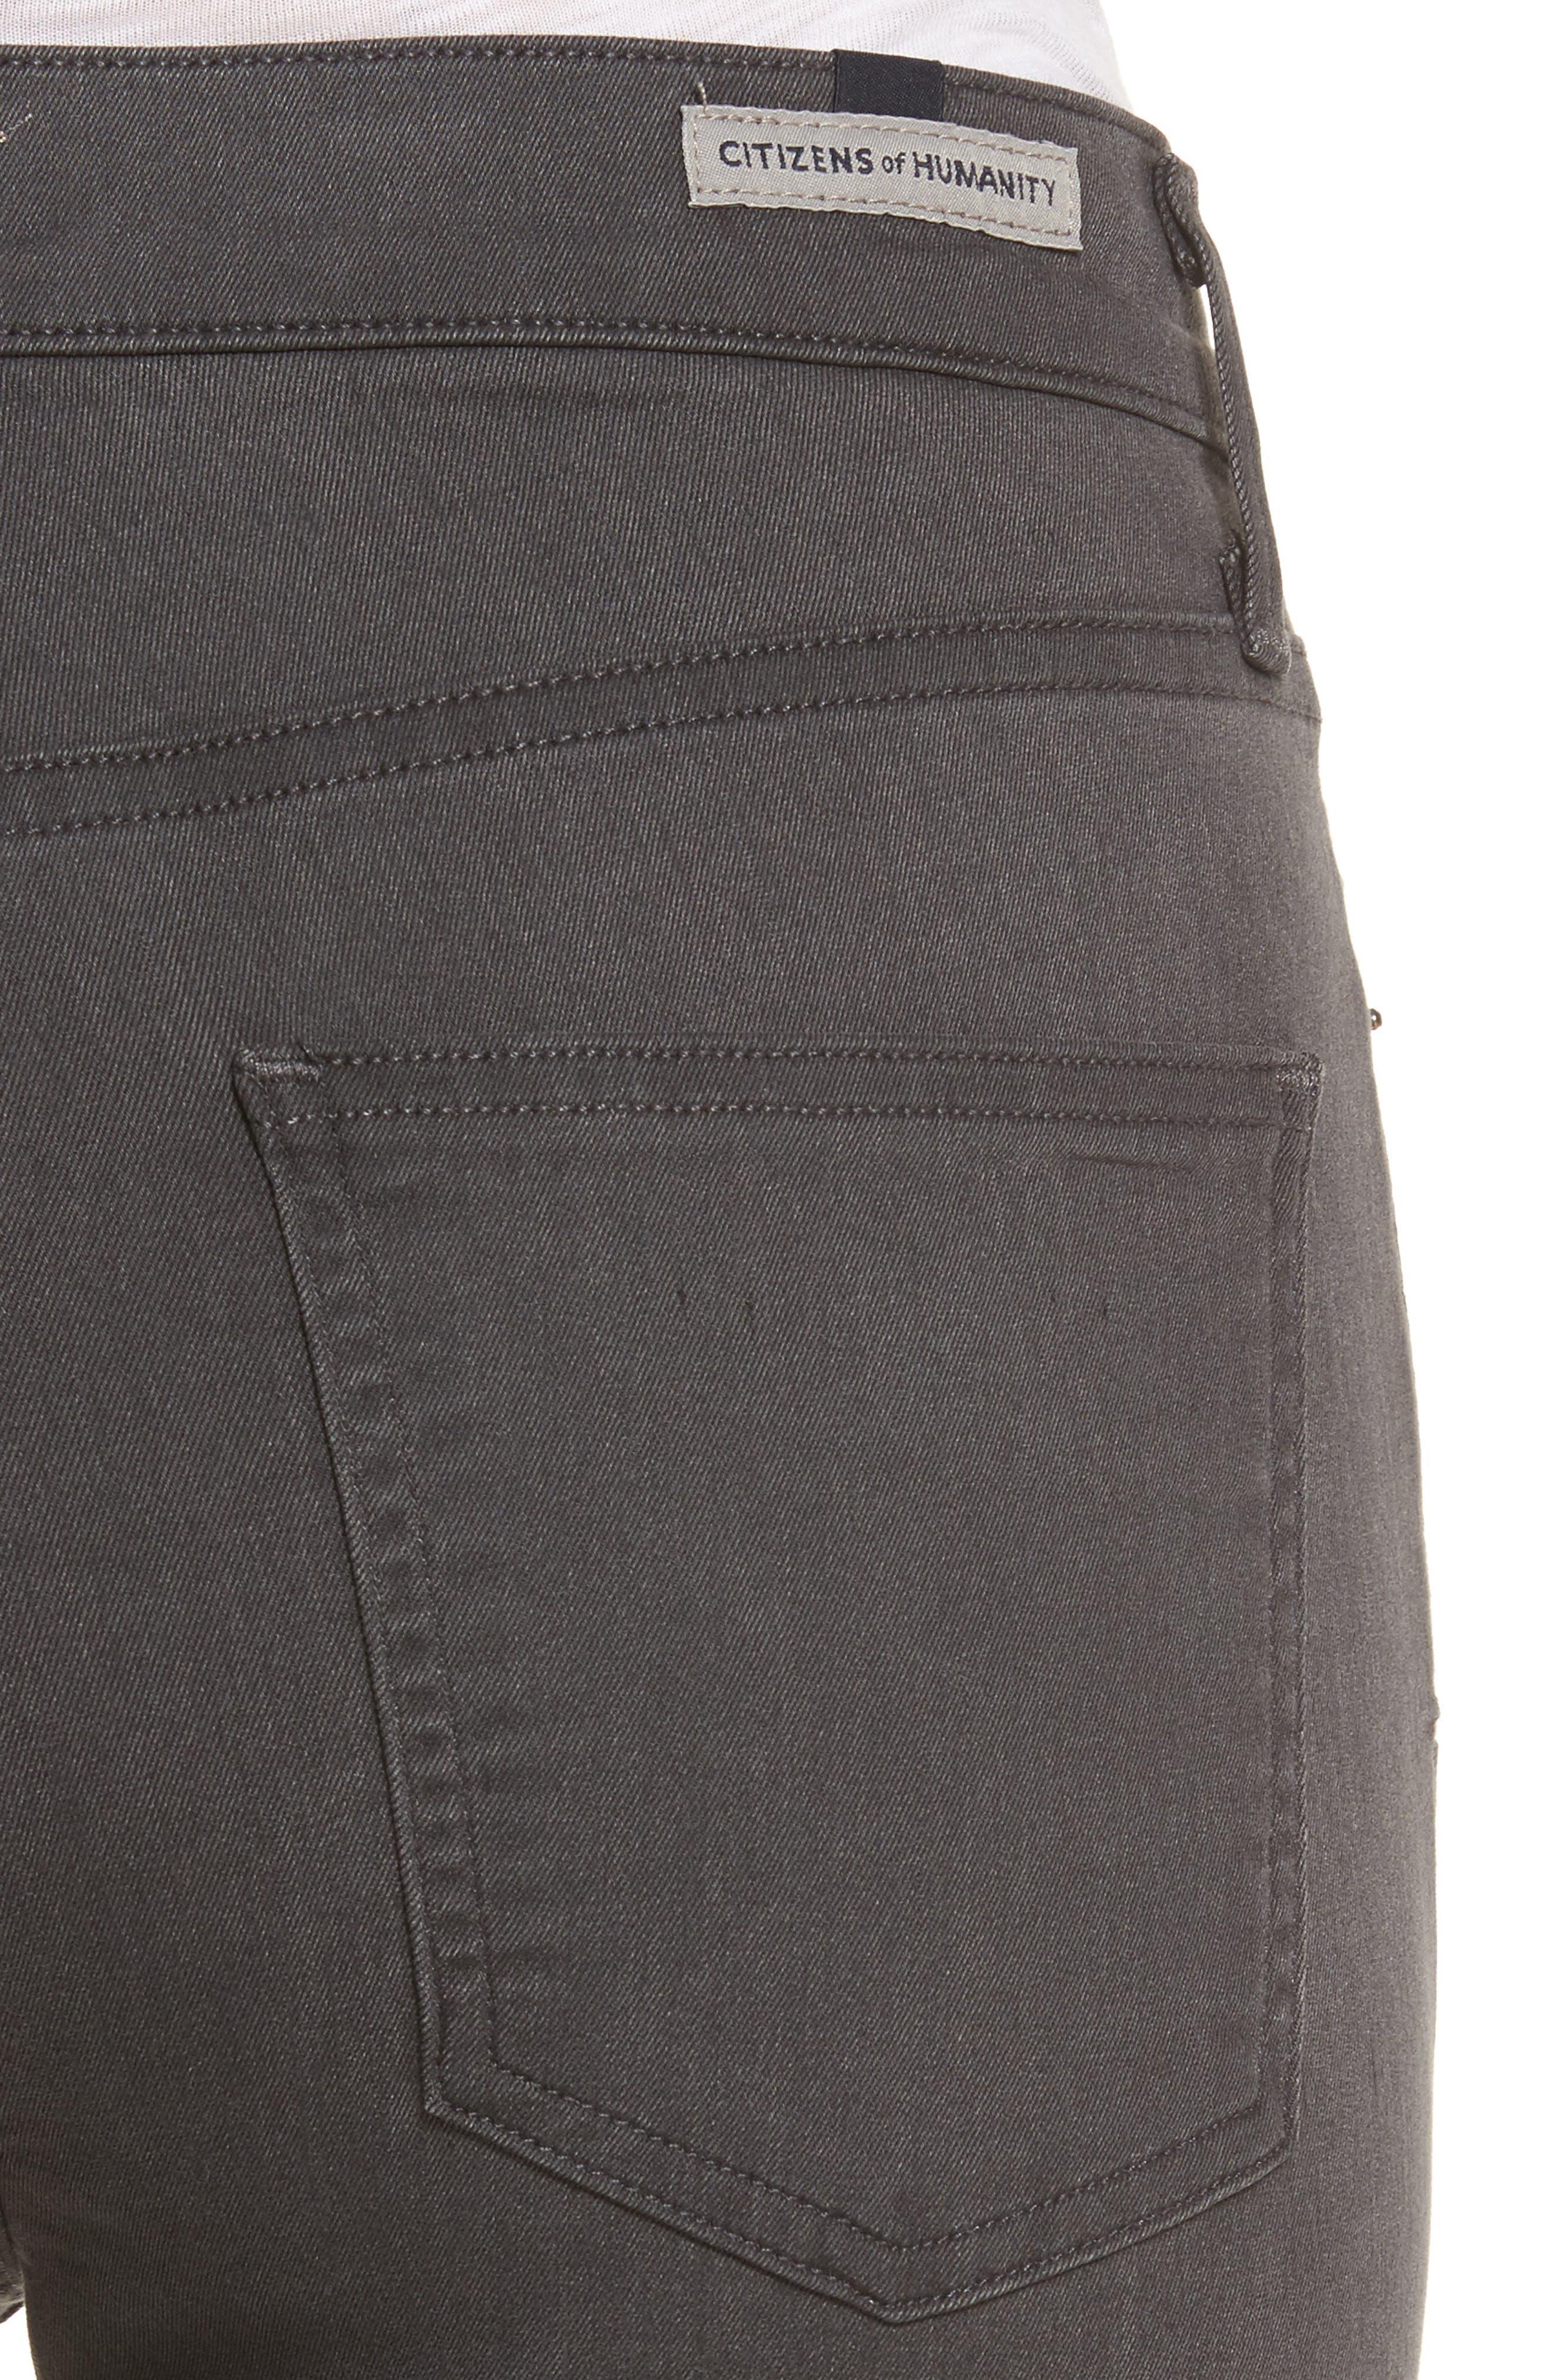 Alternate Image 4  - Citizens of Humanity Rocket Petite High Waist Skinny Jeans (Presidio)